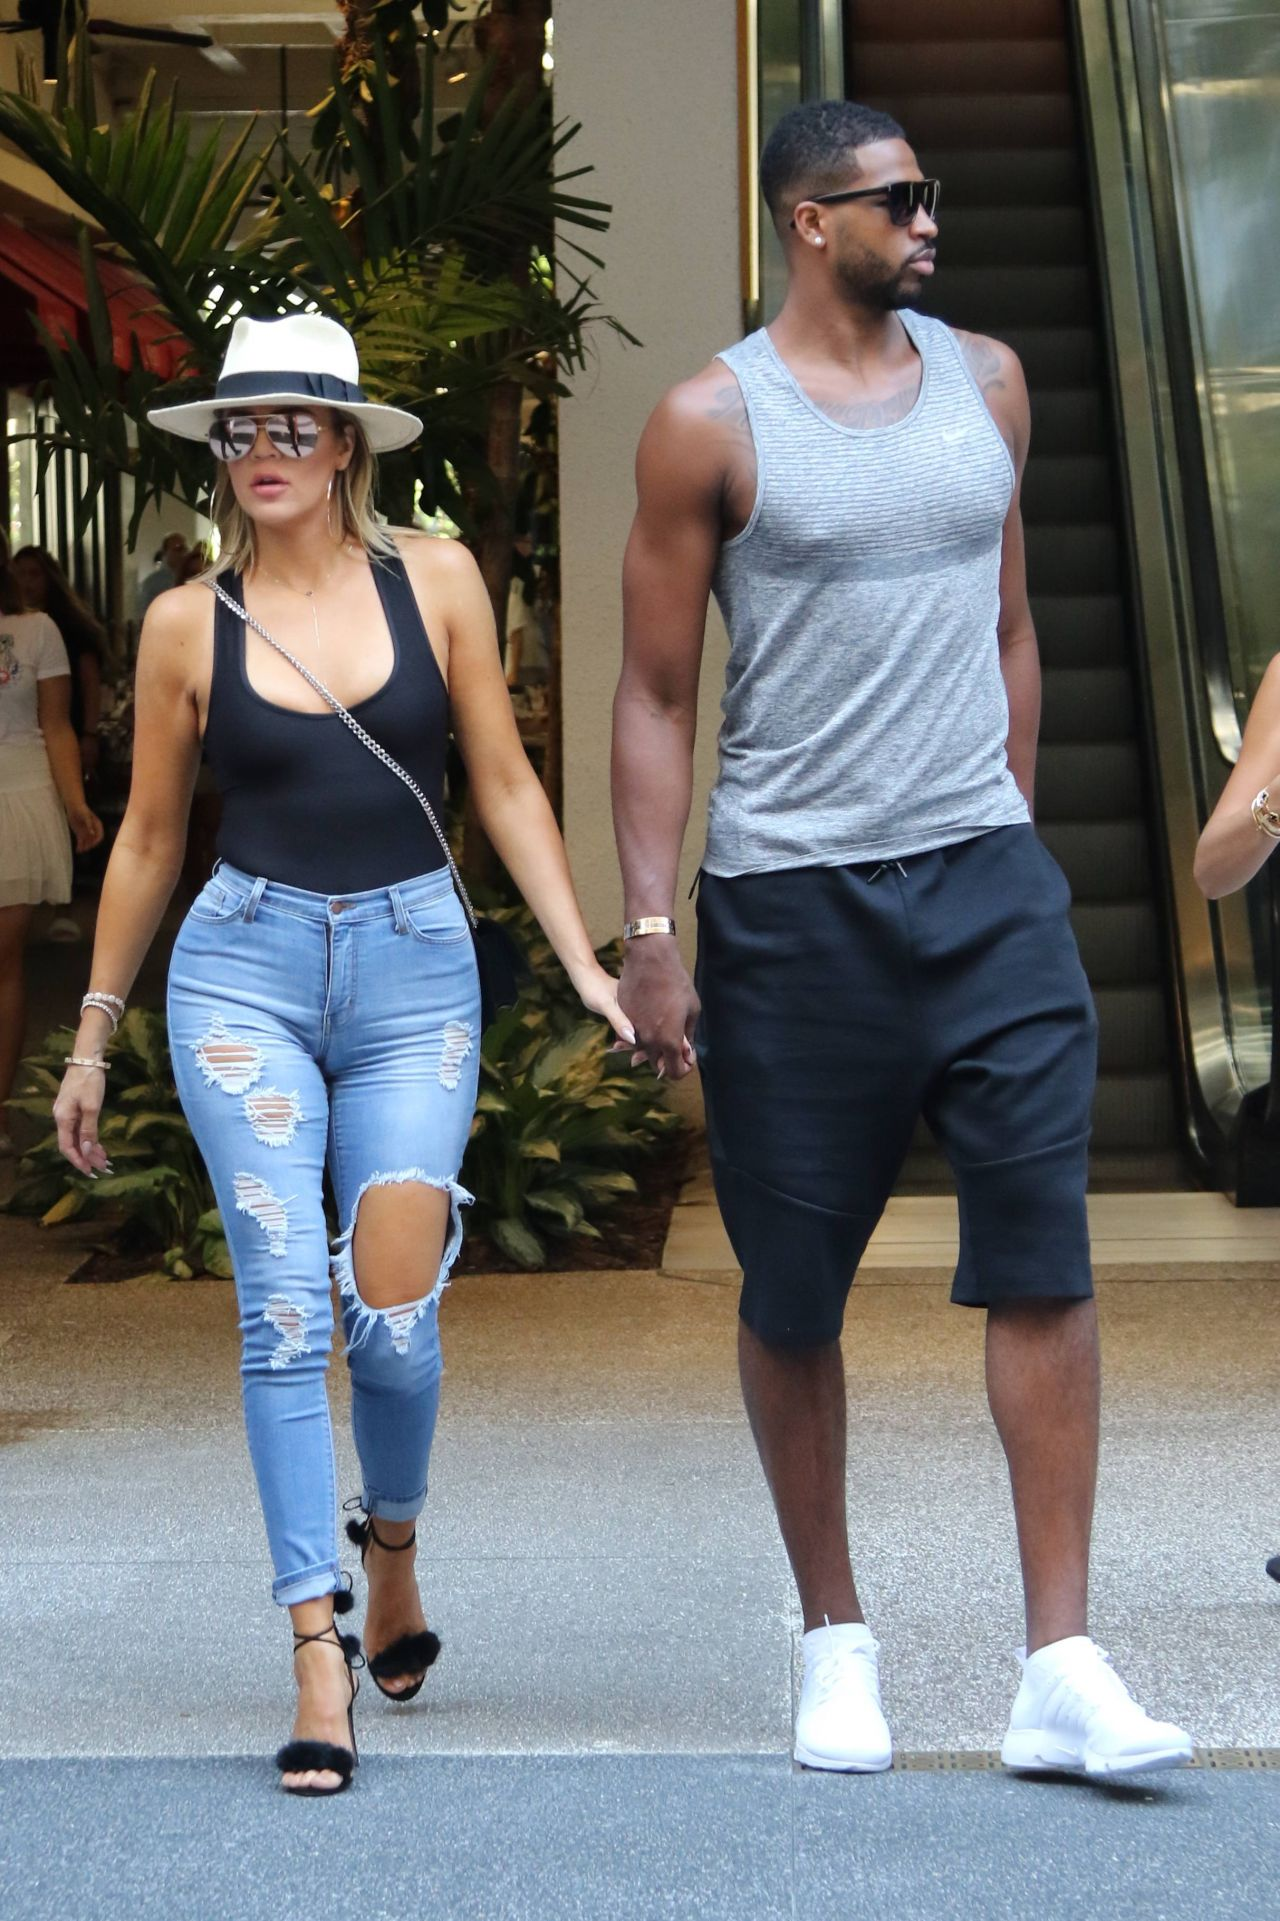 Kim Kardashian North West And Khole Kardashian Out In